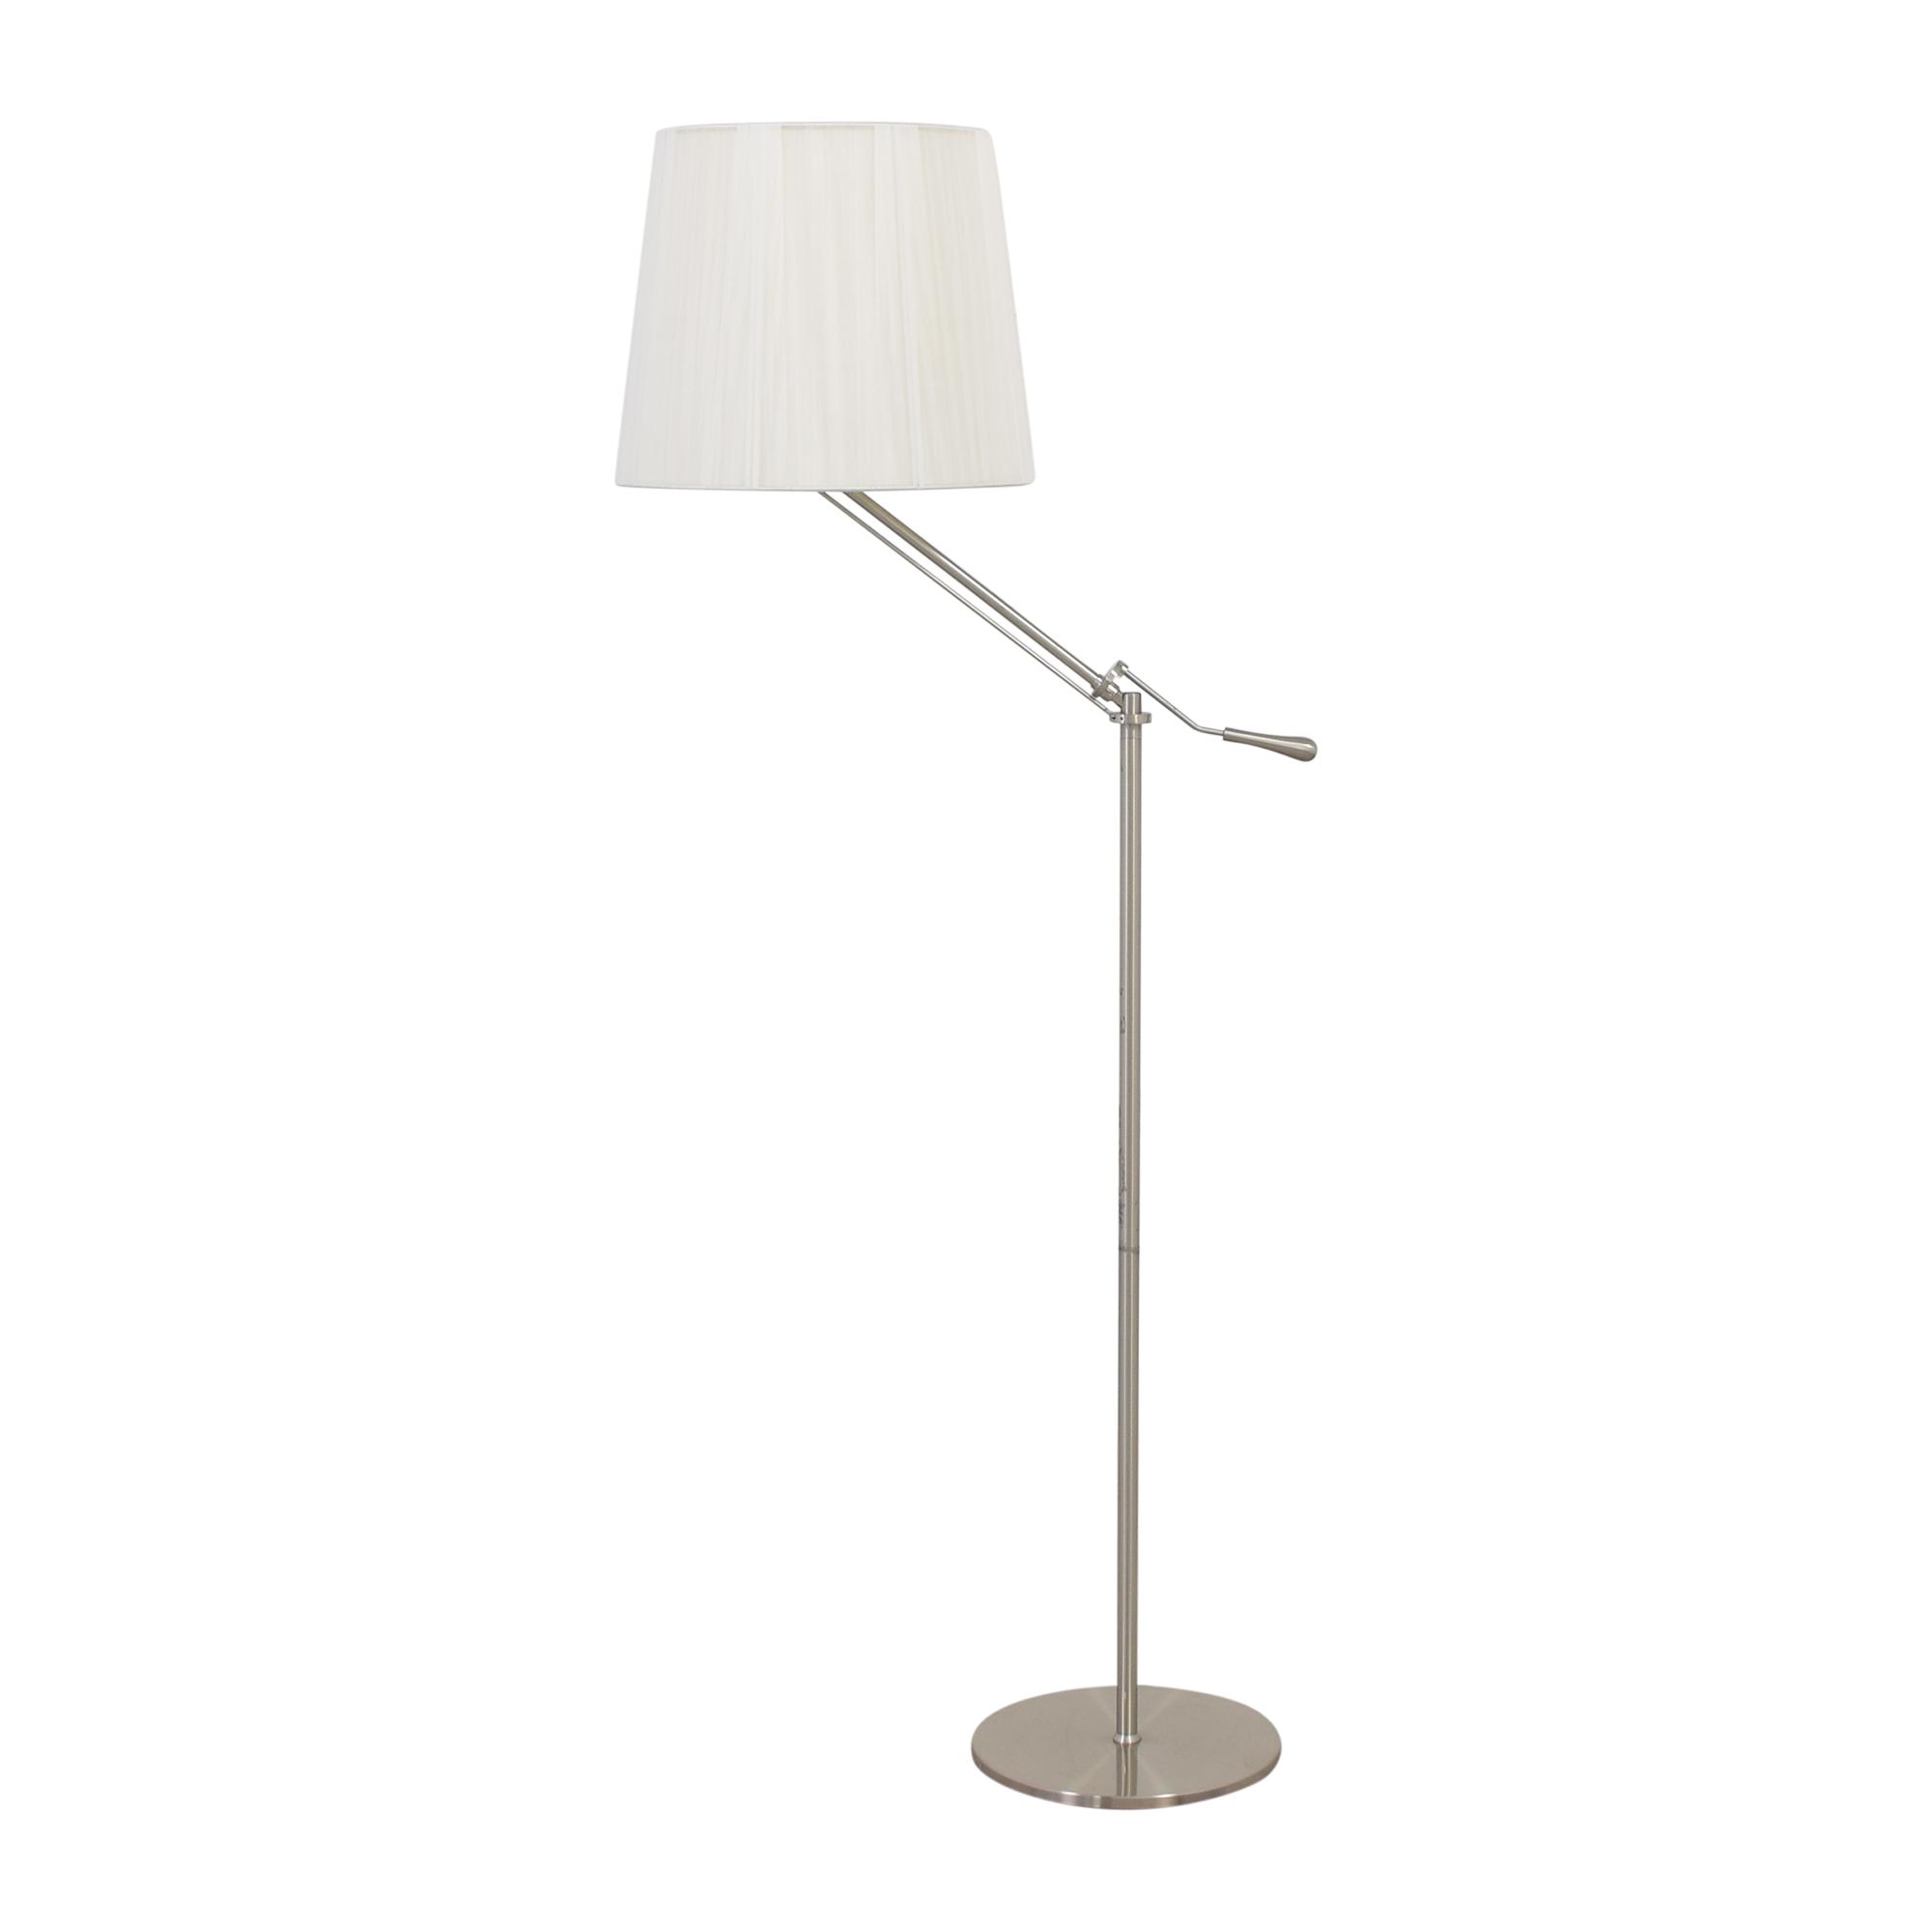 Gracious Home Swing Arm Floor Lamp / Lamps